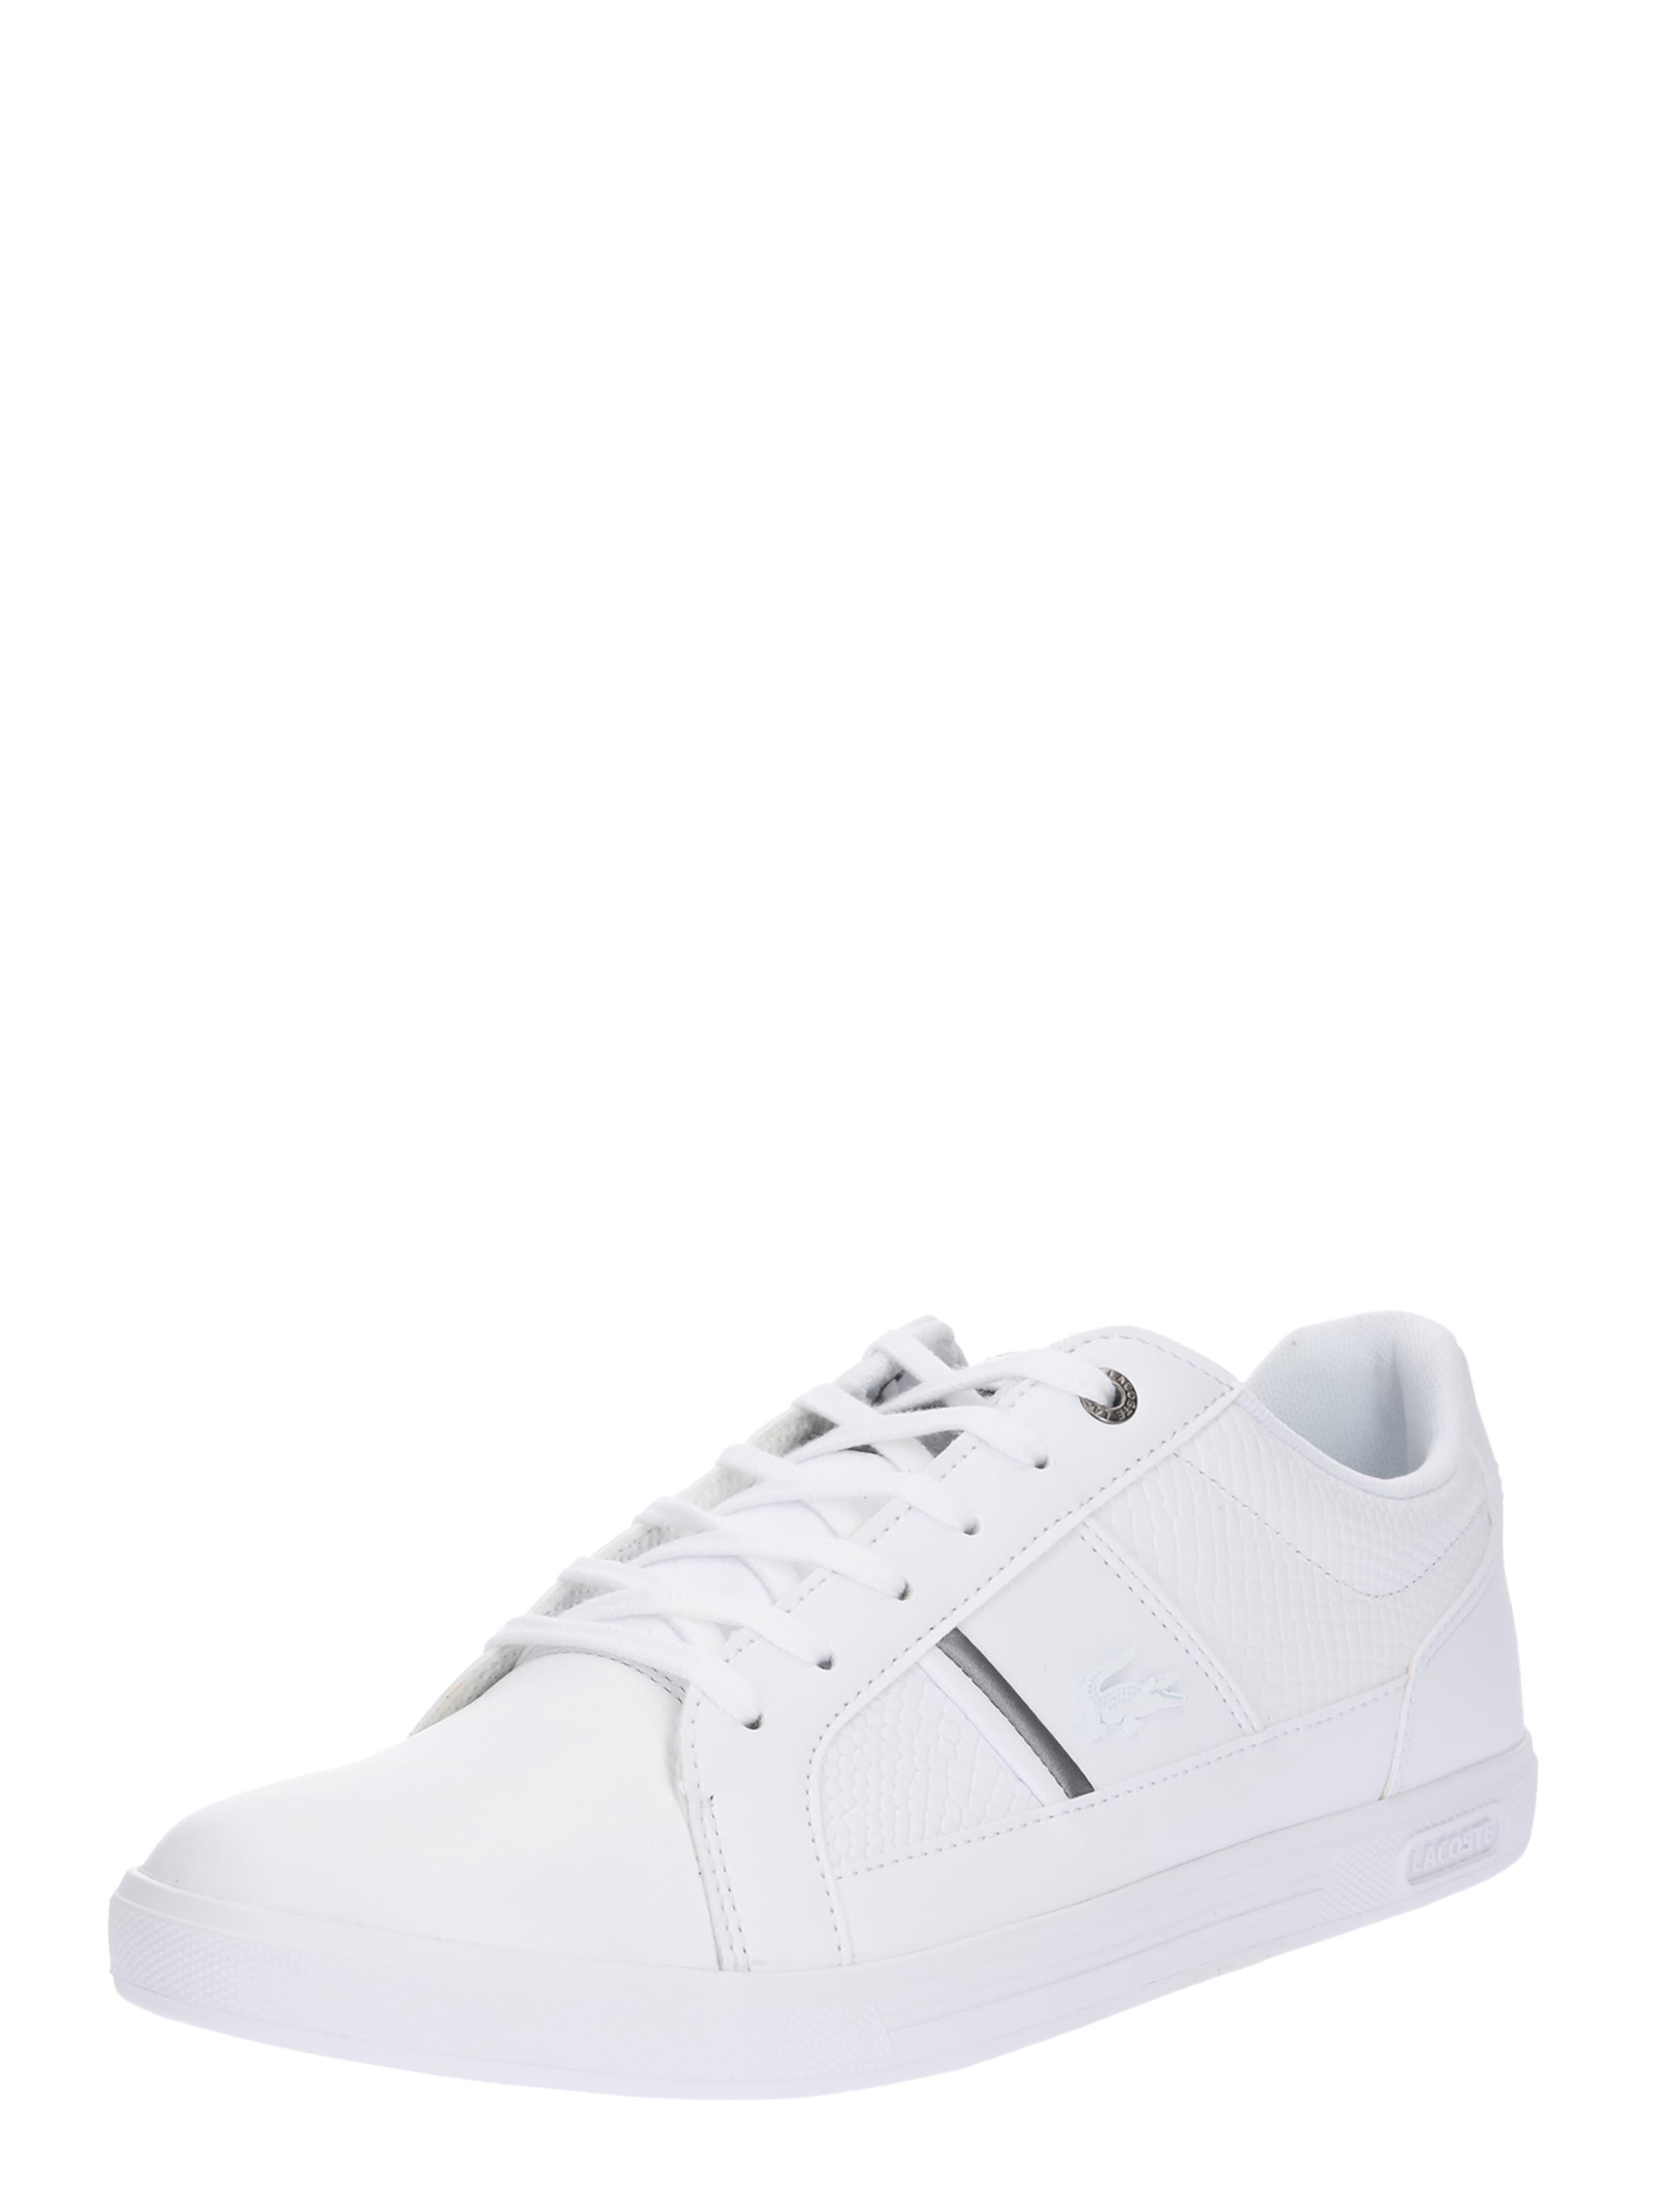 LACOSTE | Freizeitschuh 'Europa 417 1' Schuhe Gut getragene Schuhe